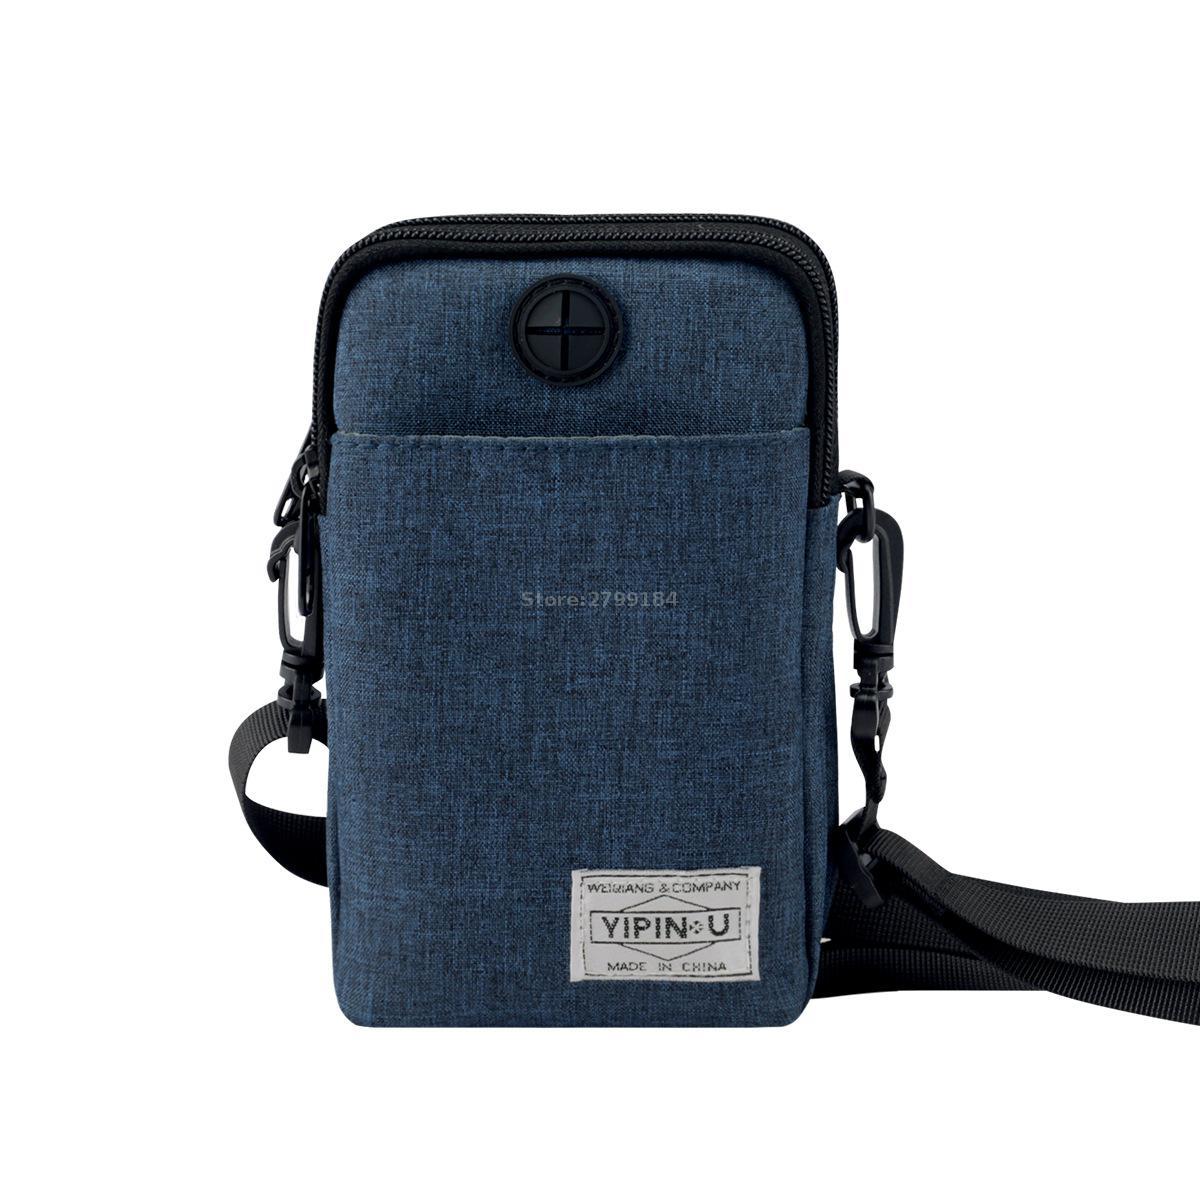 YIPINU Multifunctional Waterproof Outdoor Phone Bag Anti-theft Security Sport Mini Bag Wallet ID Holder Passport Holder Neck Bag